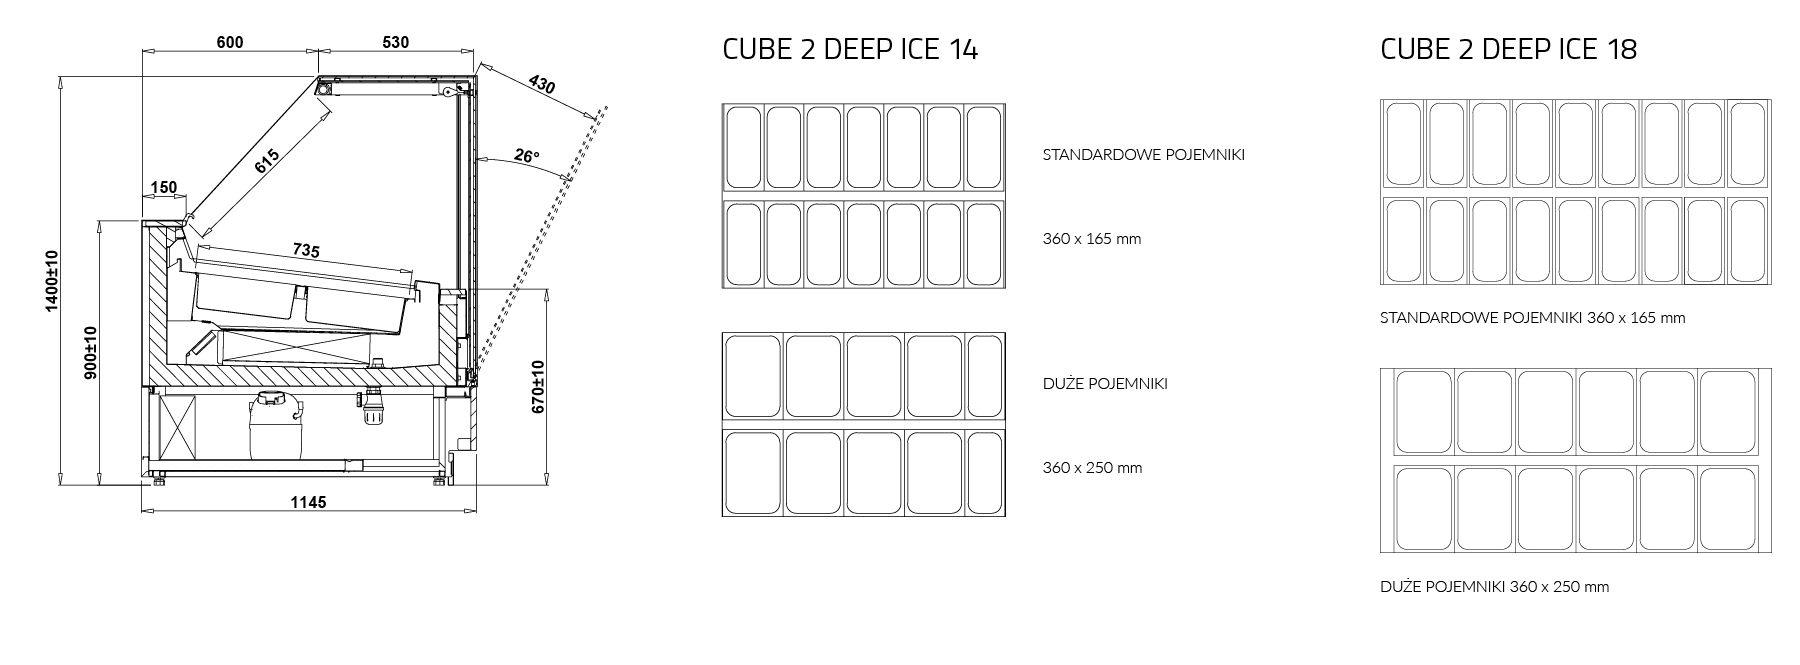 Technische Bezeichnung Eistheken CUBE 2 DEEP ICE MOD C